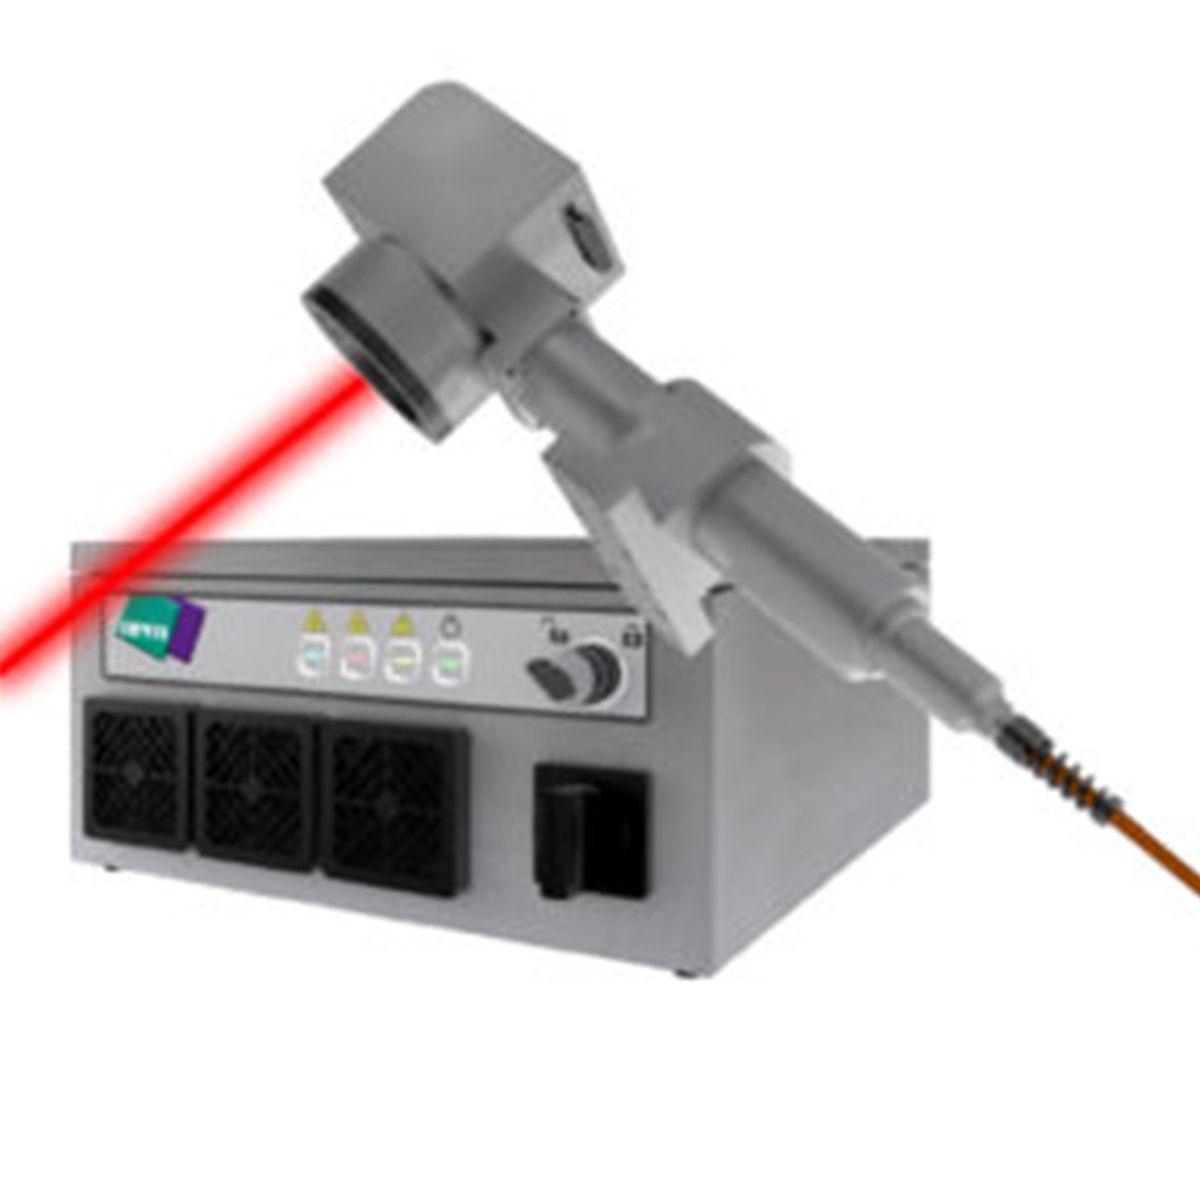 لیزر فایبر مارکر CO2 LASER MARKER 10 W